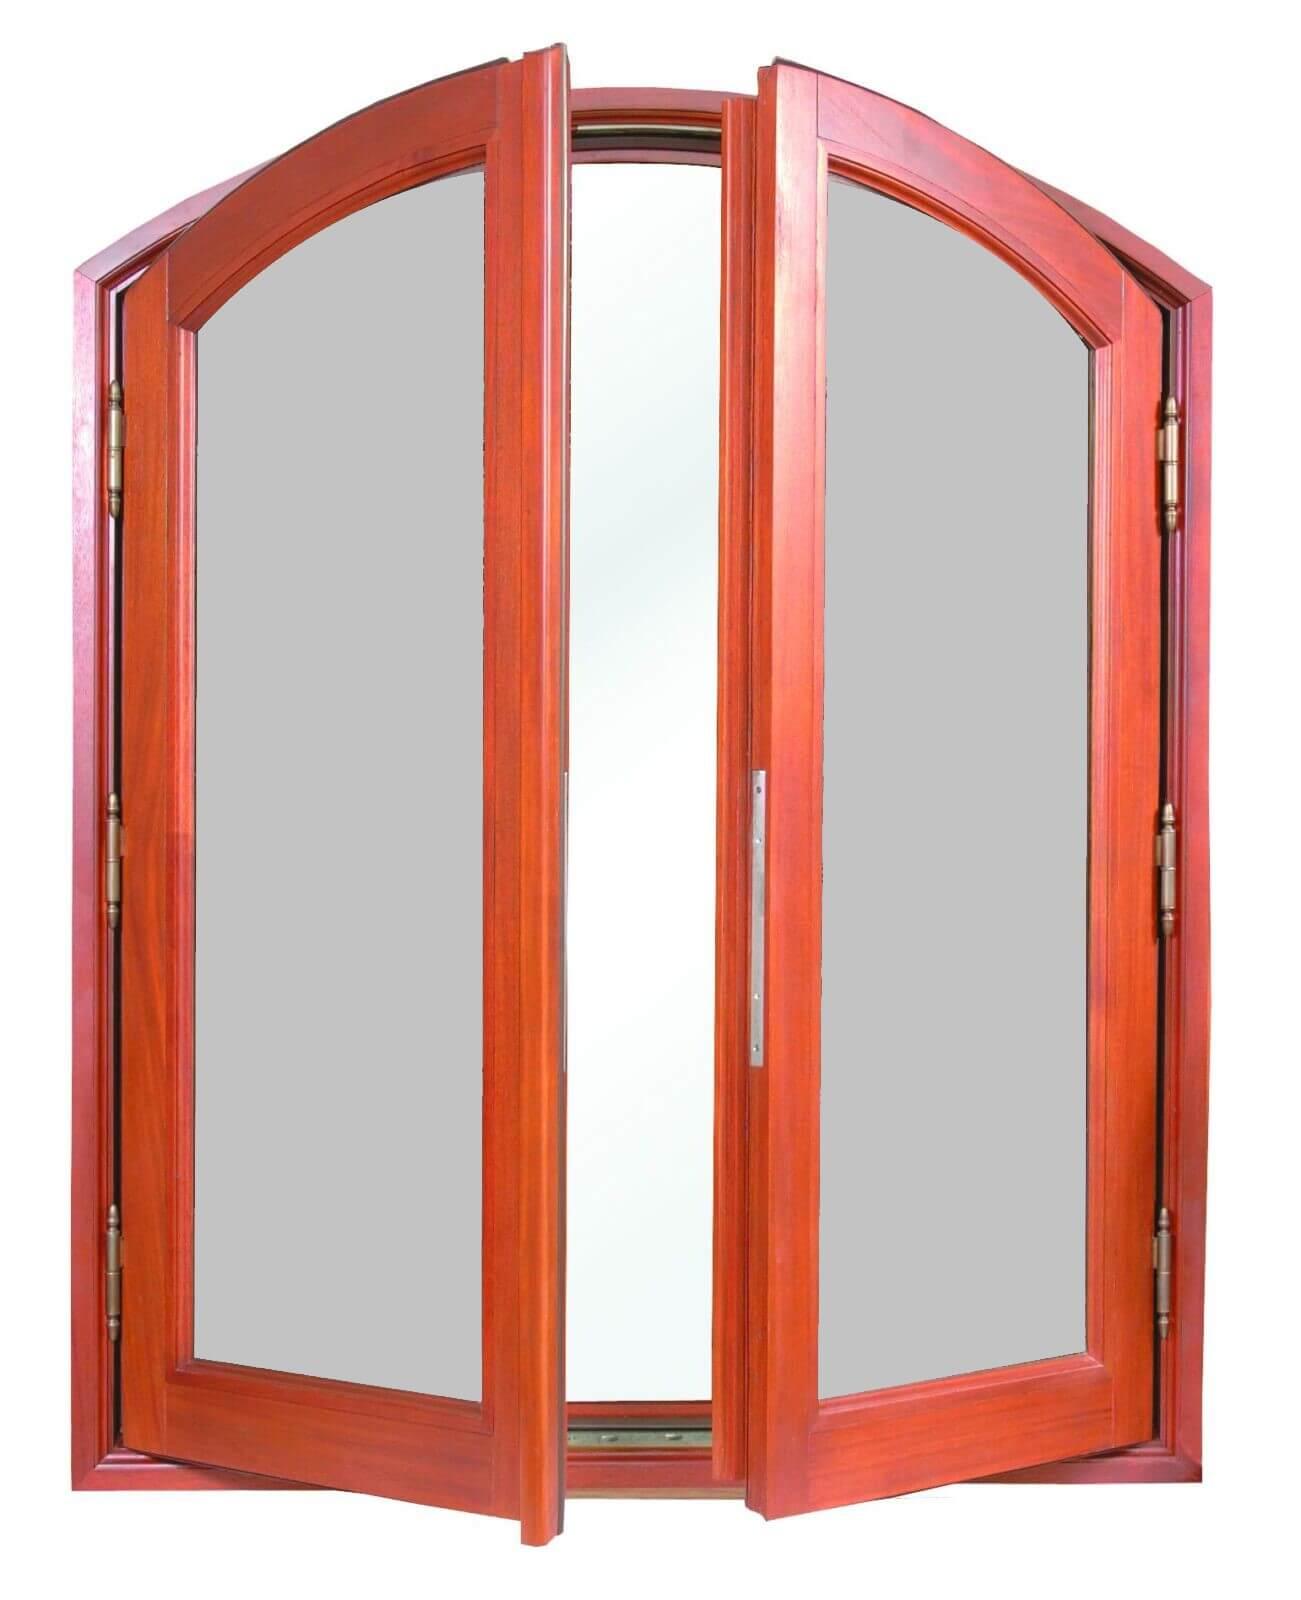 SAN PEDRO MAHOGANY ELLIPTICAL TOB DOUBLE CASEMENT WINDOWS